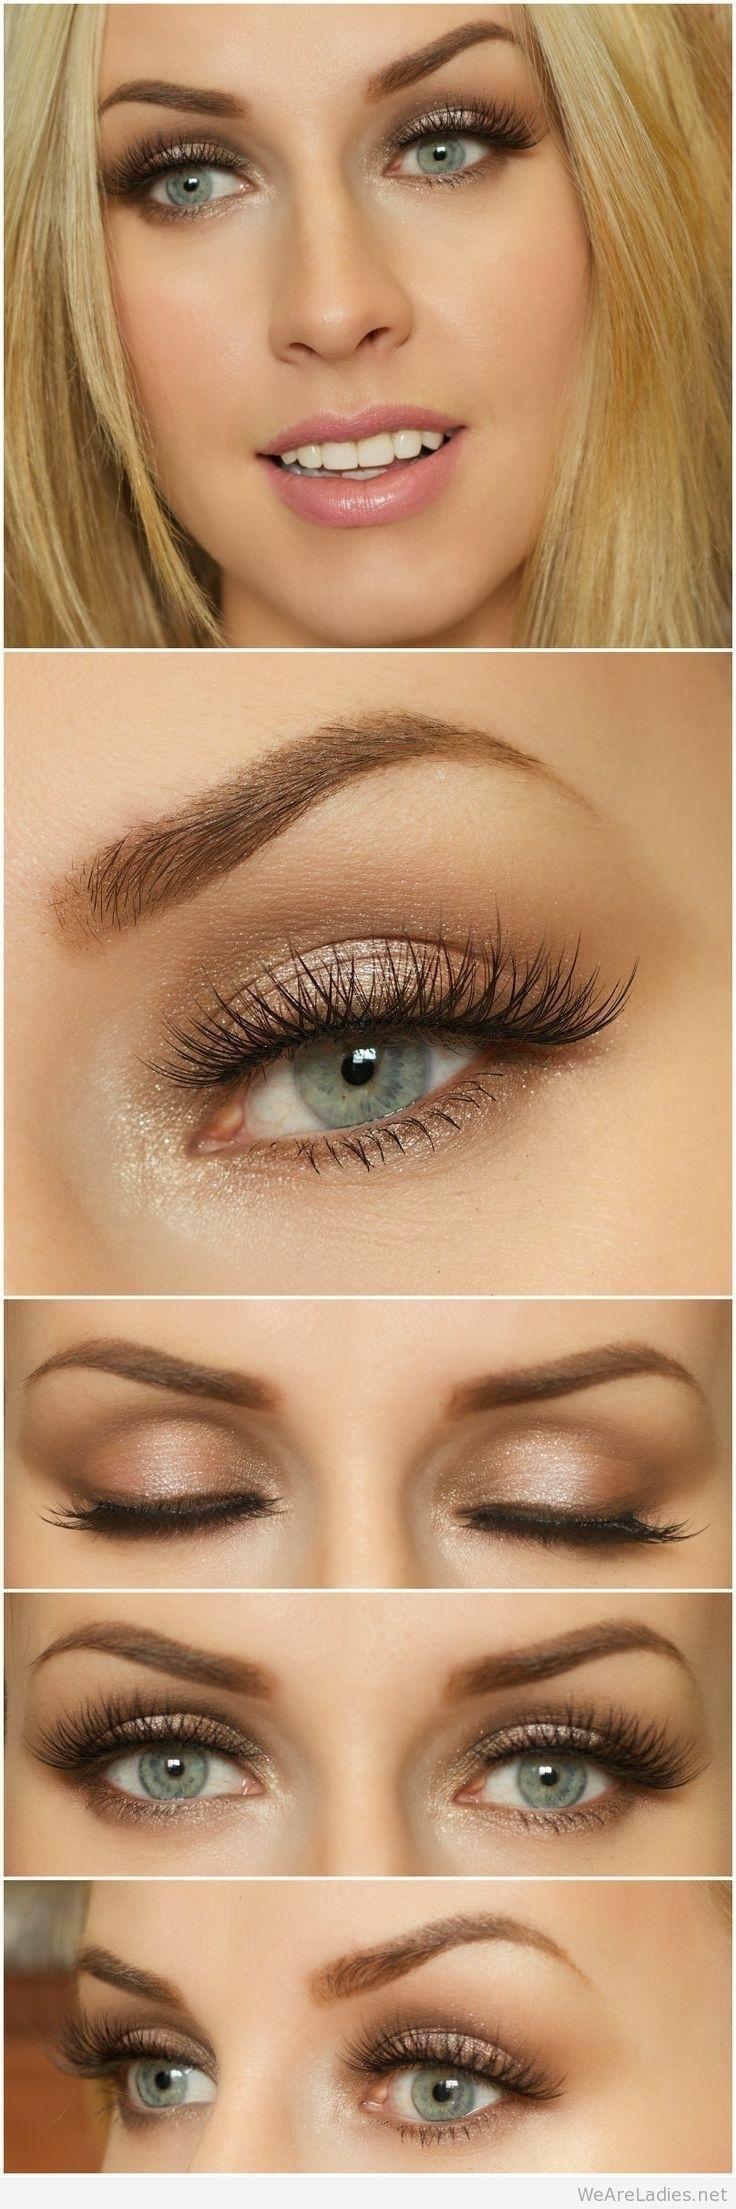 Eyeshadow For Blue Green Eyes And Dirty Blonde Hair – Wavy Haircut regarding Eyeshadow For Blue Green Eyes And Blonde Hair